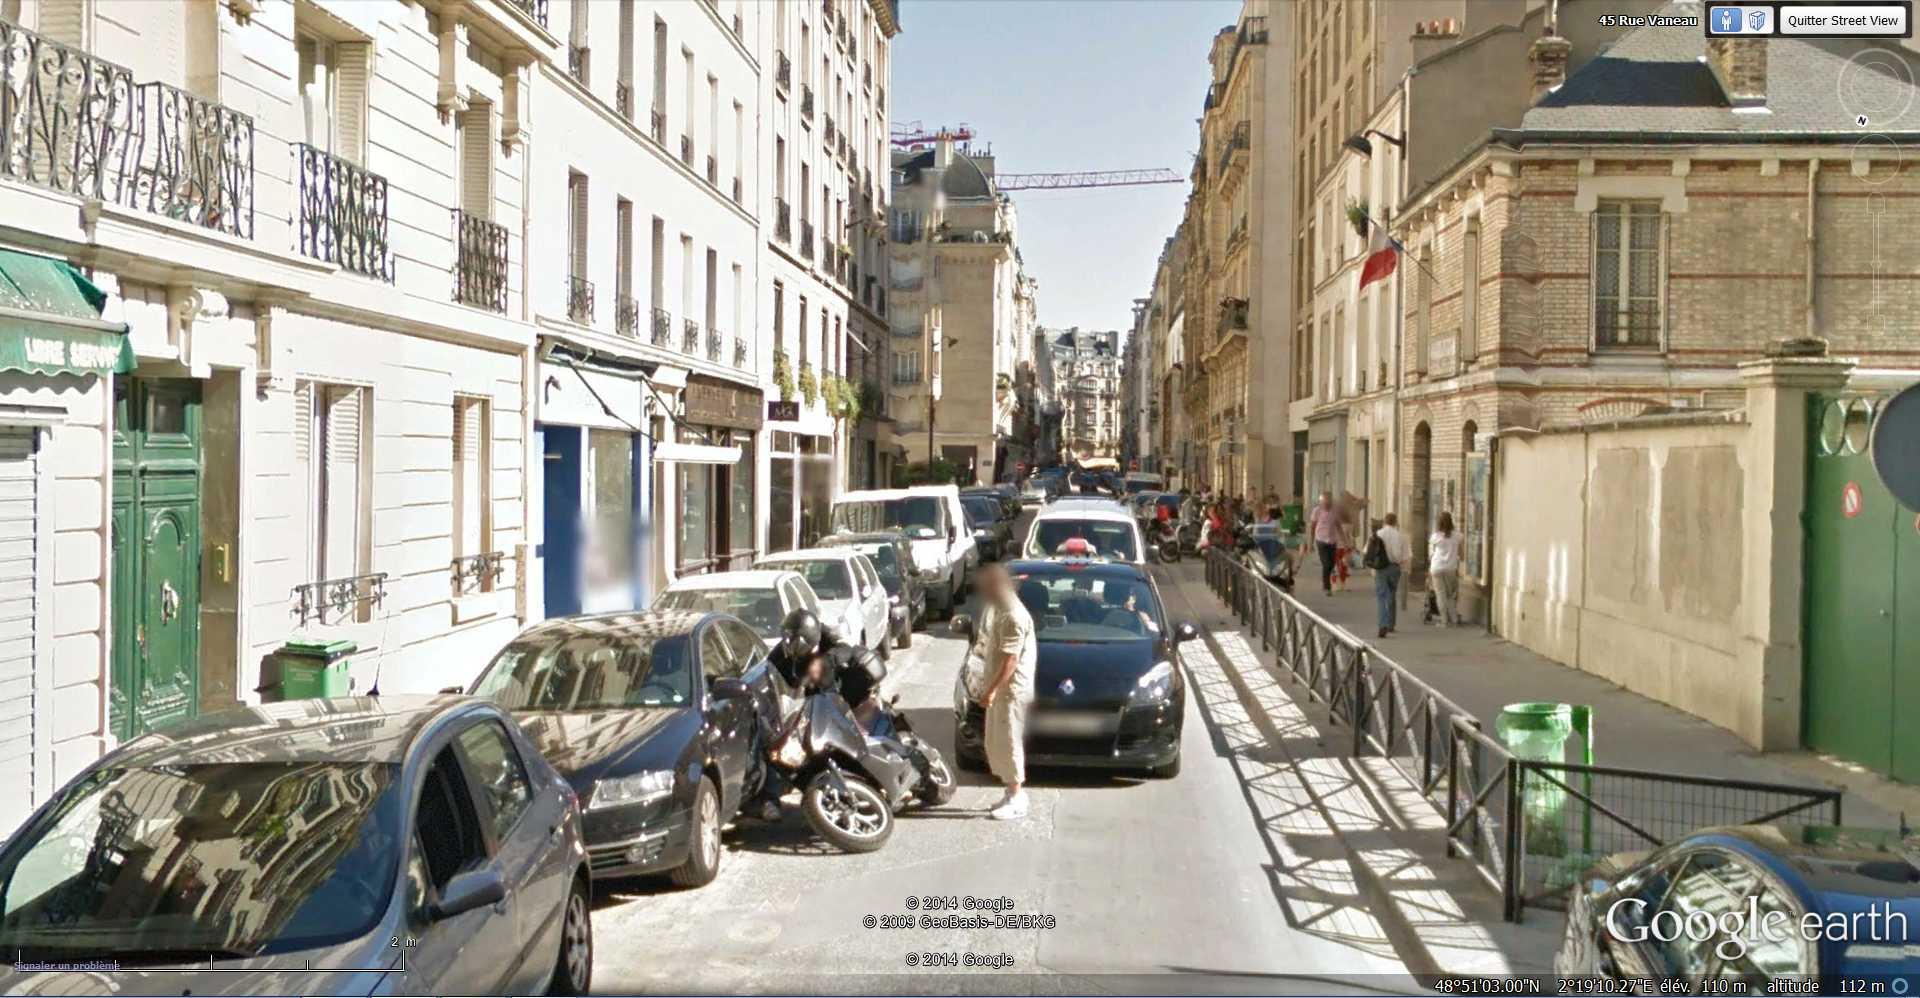 STREET VIEW : Chute de moto - rue Vaneau - Paris - France  2014-312